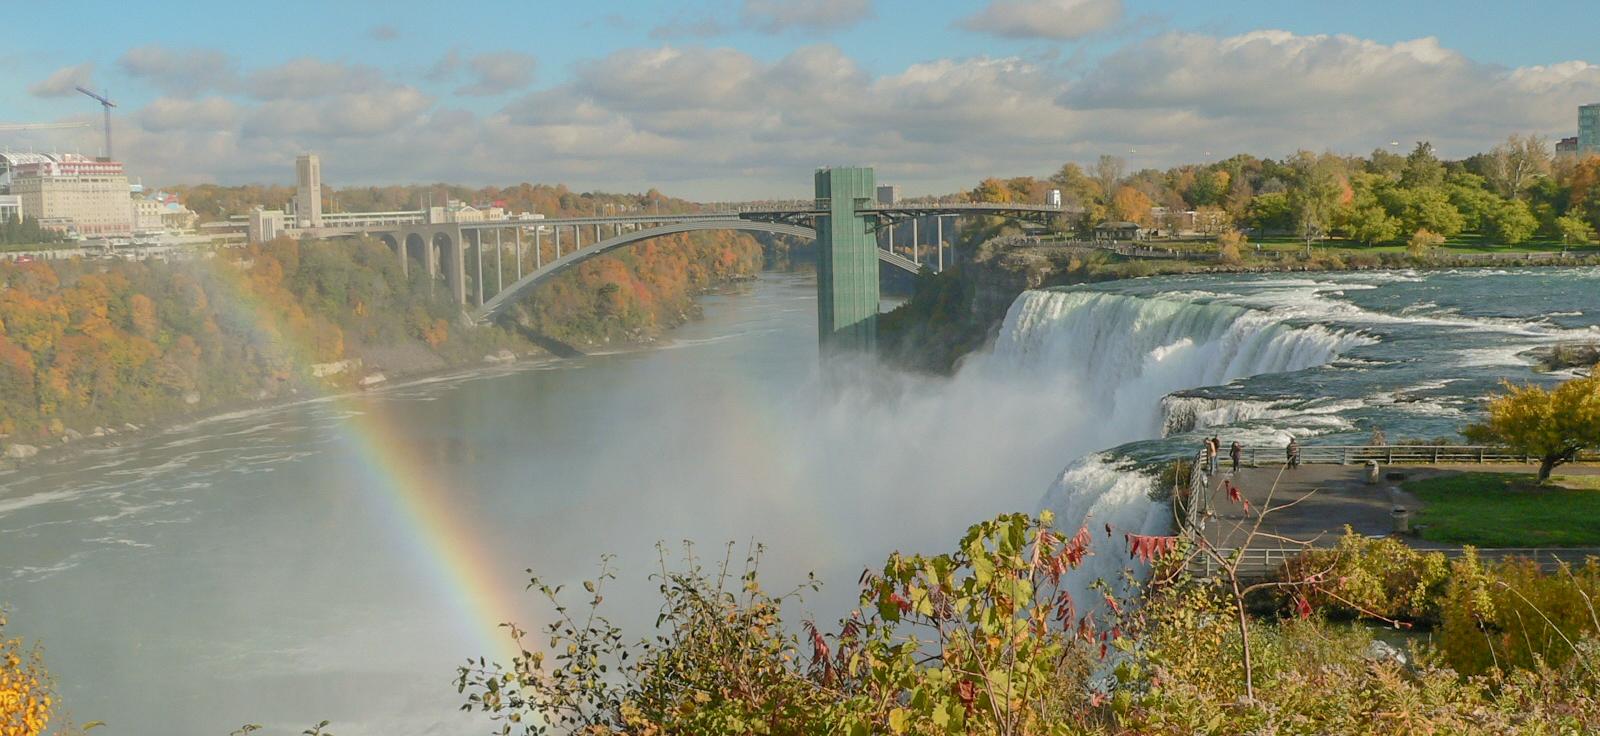 US Niagarafall